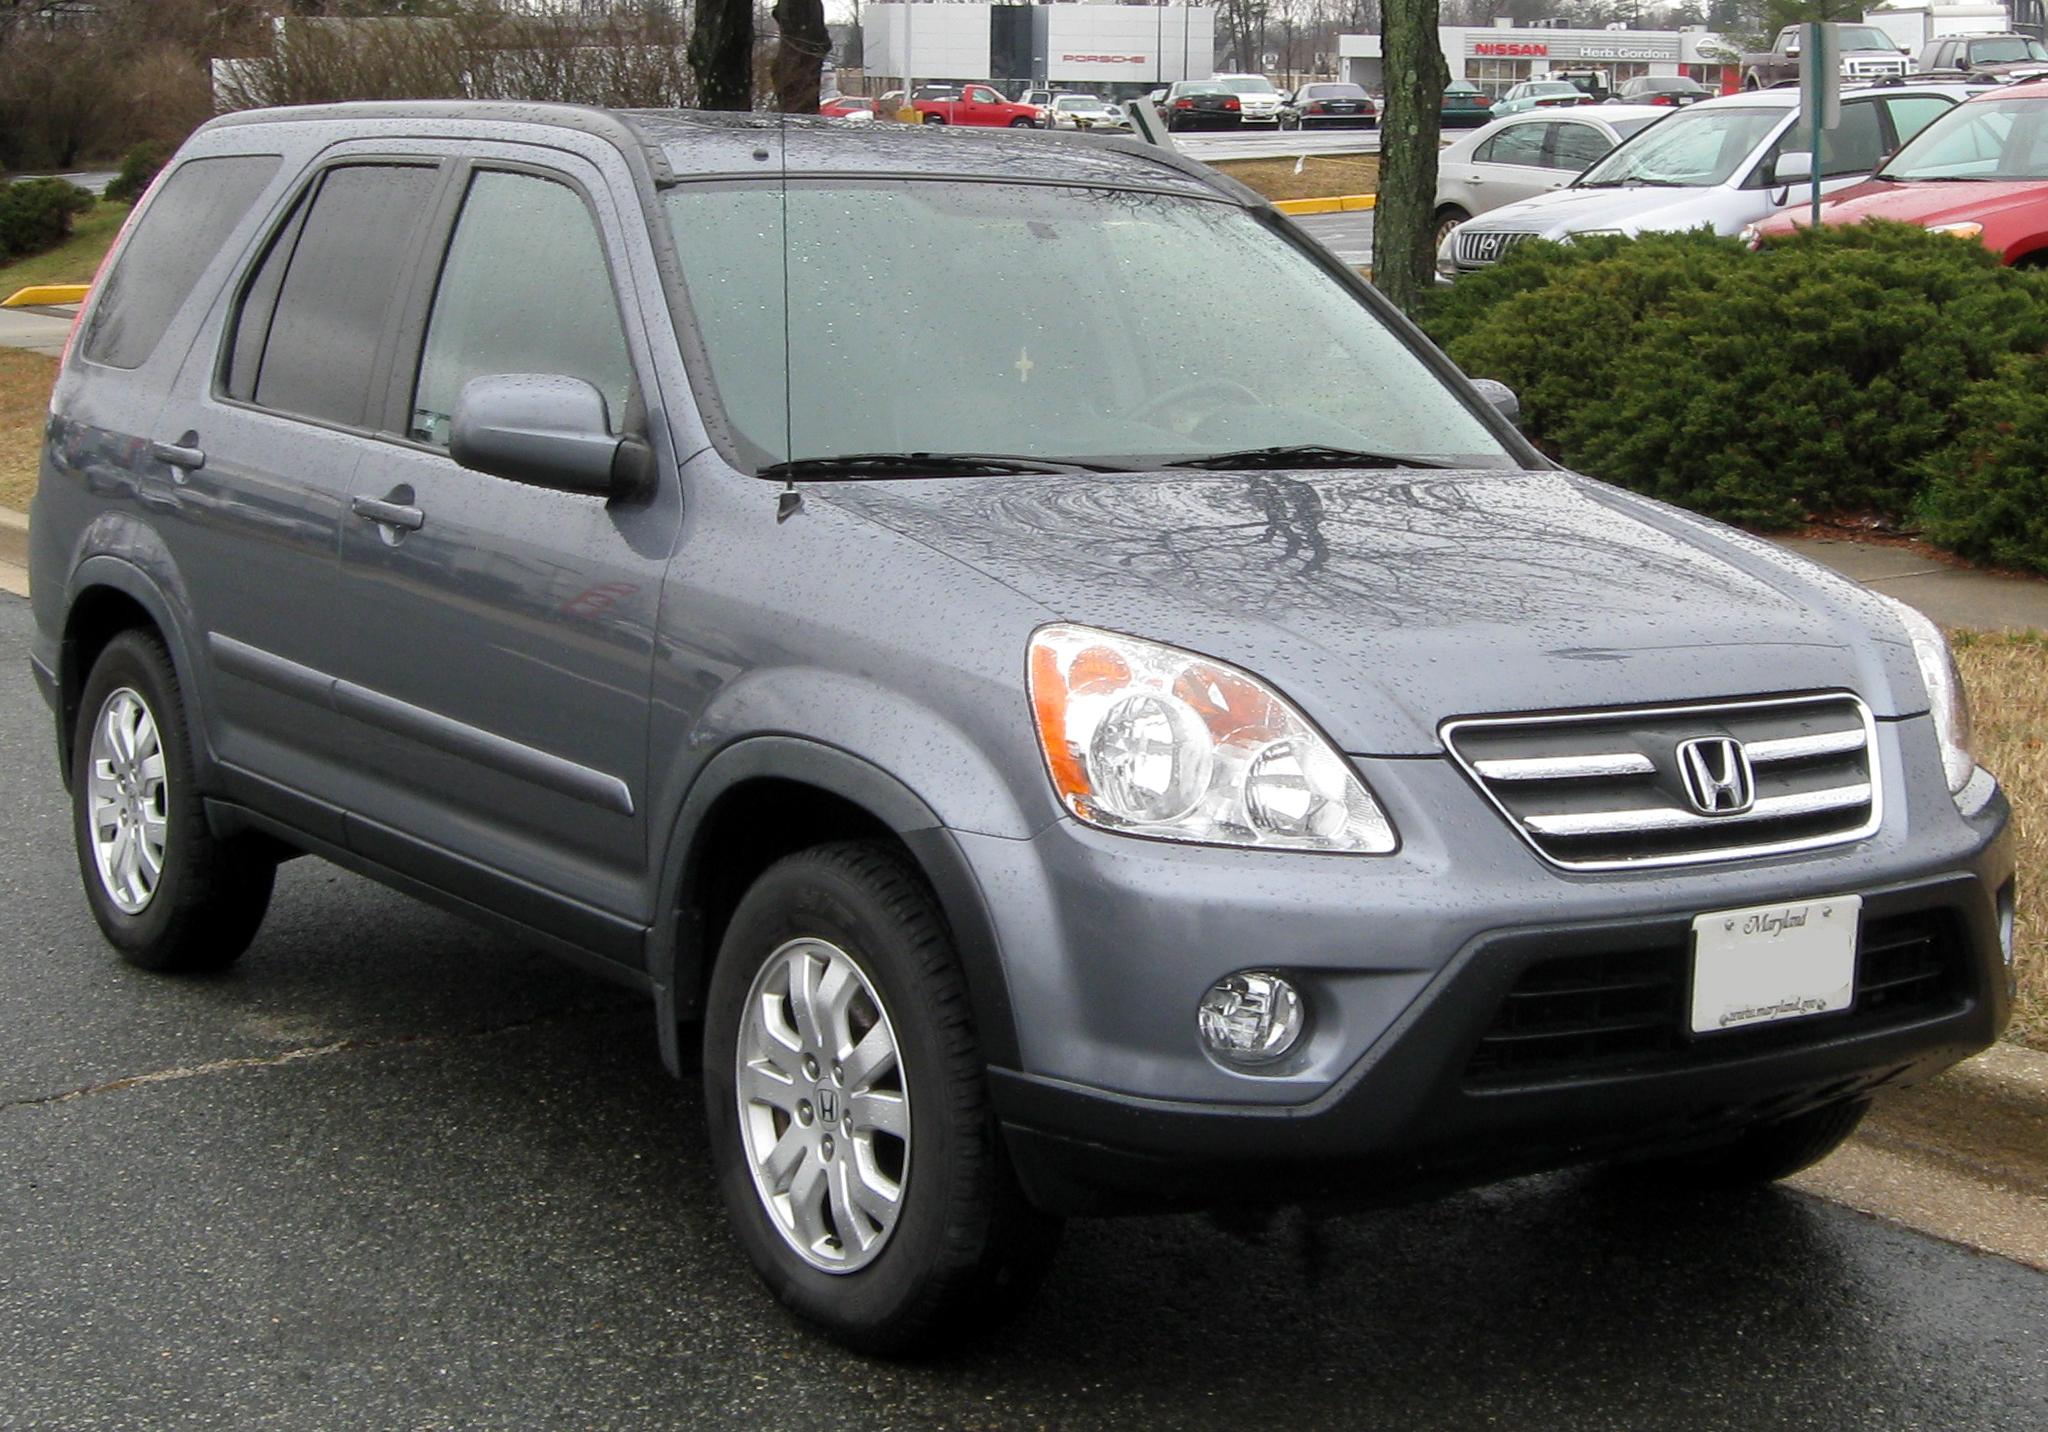 File 2005-2006 Honda Cr-v